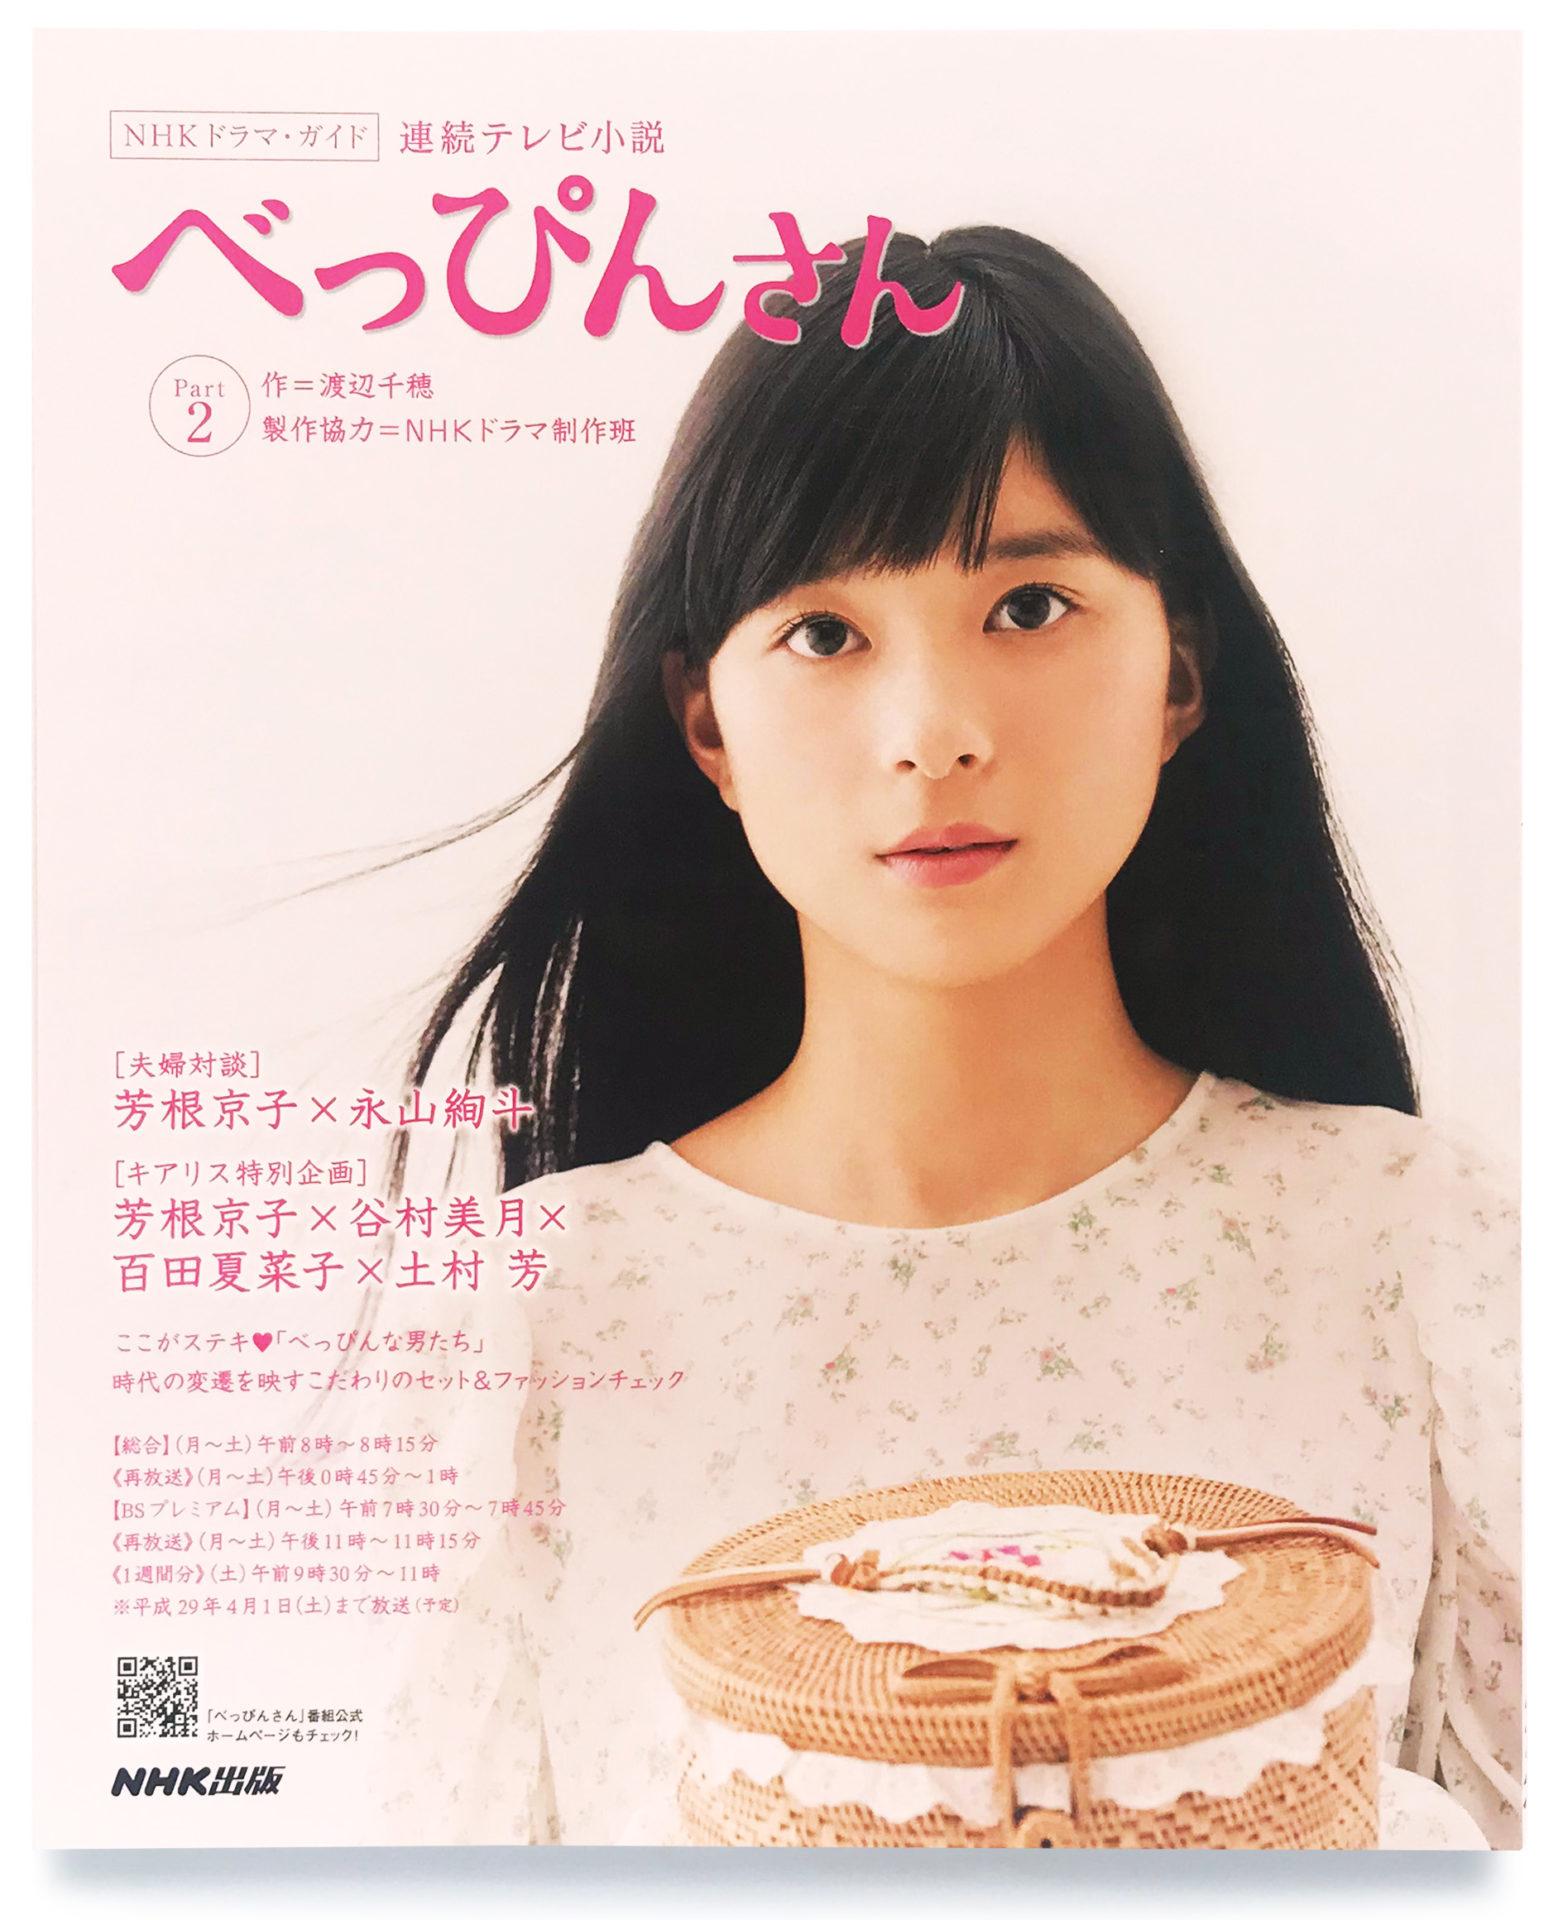 NHKドラマ・ガイド『連続テレビ小説 べっぴんさん』 1